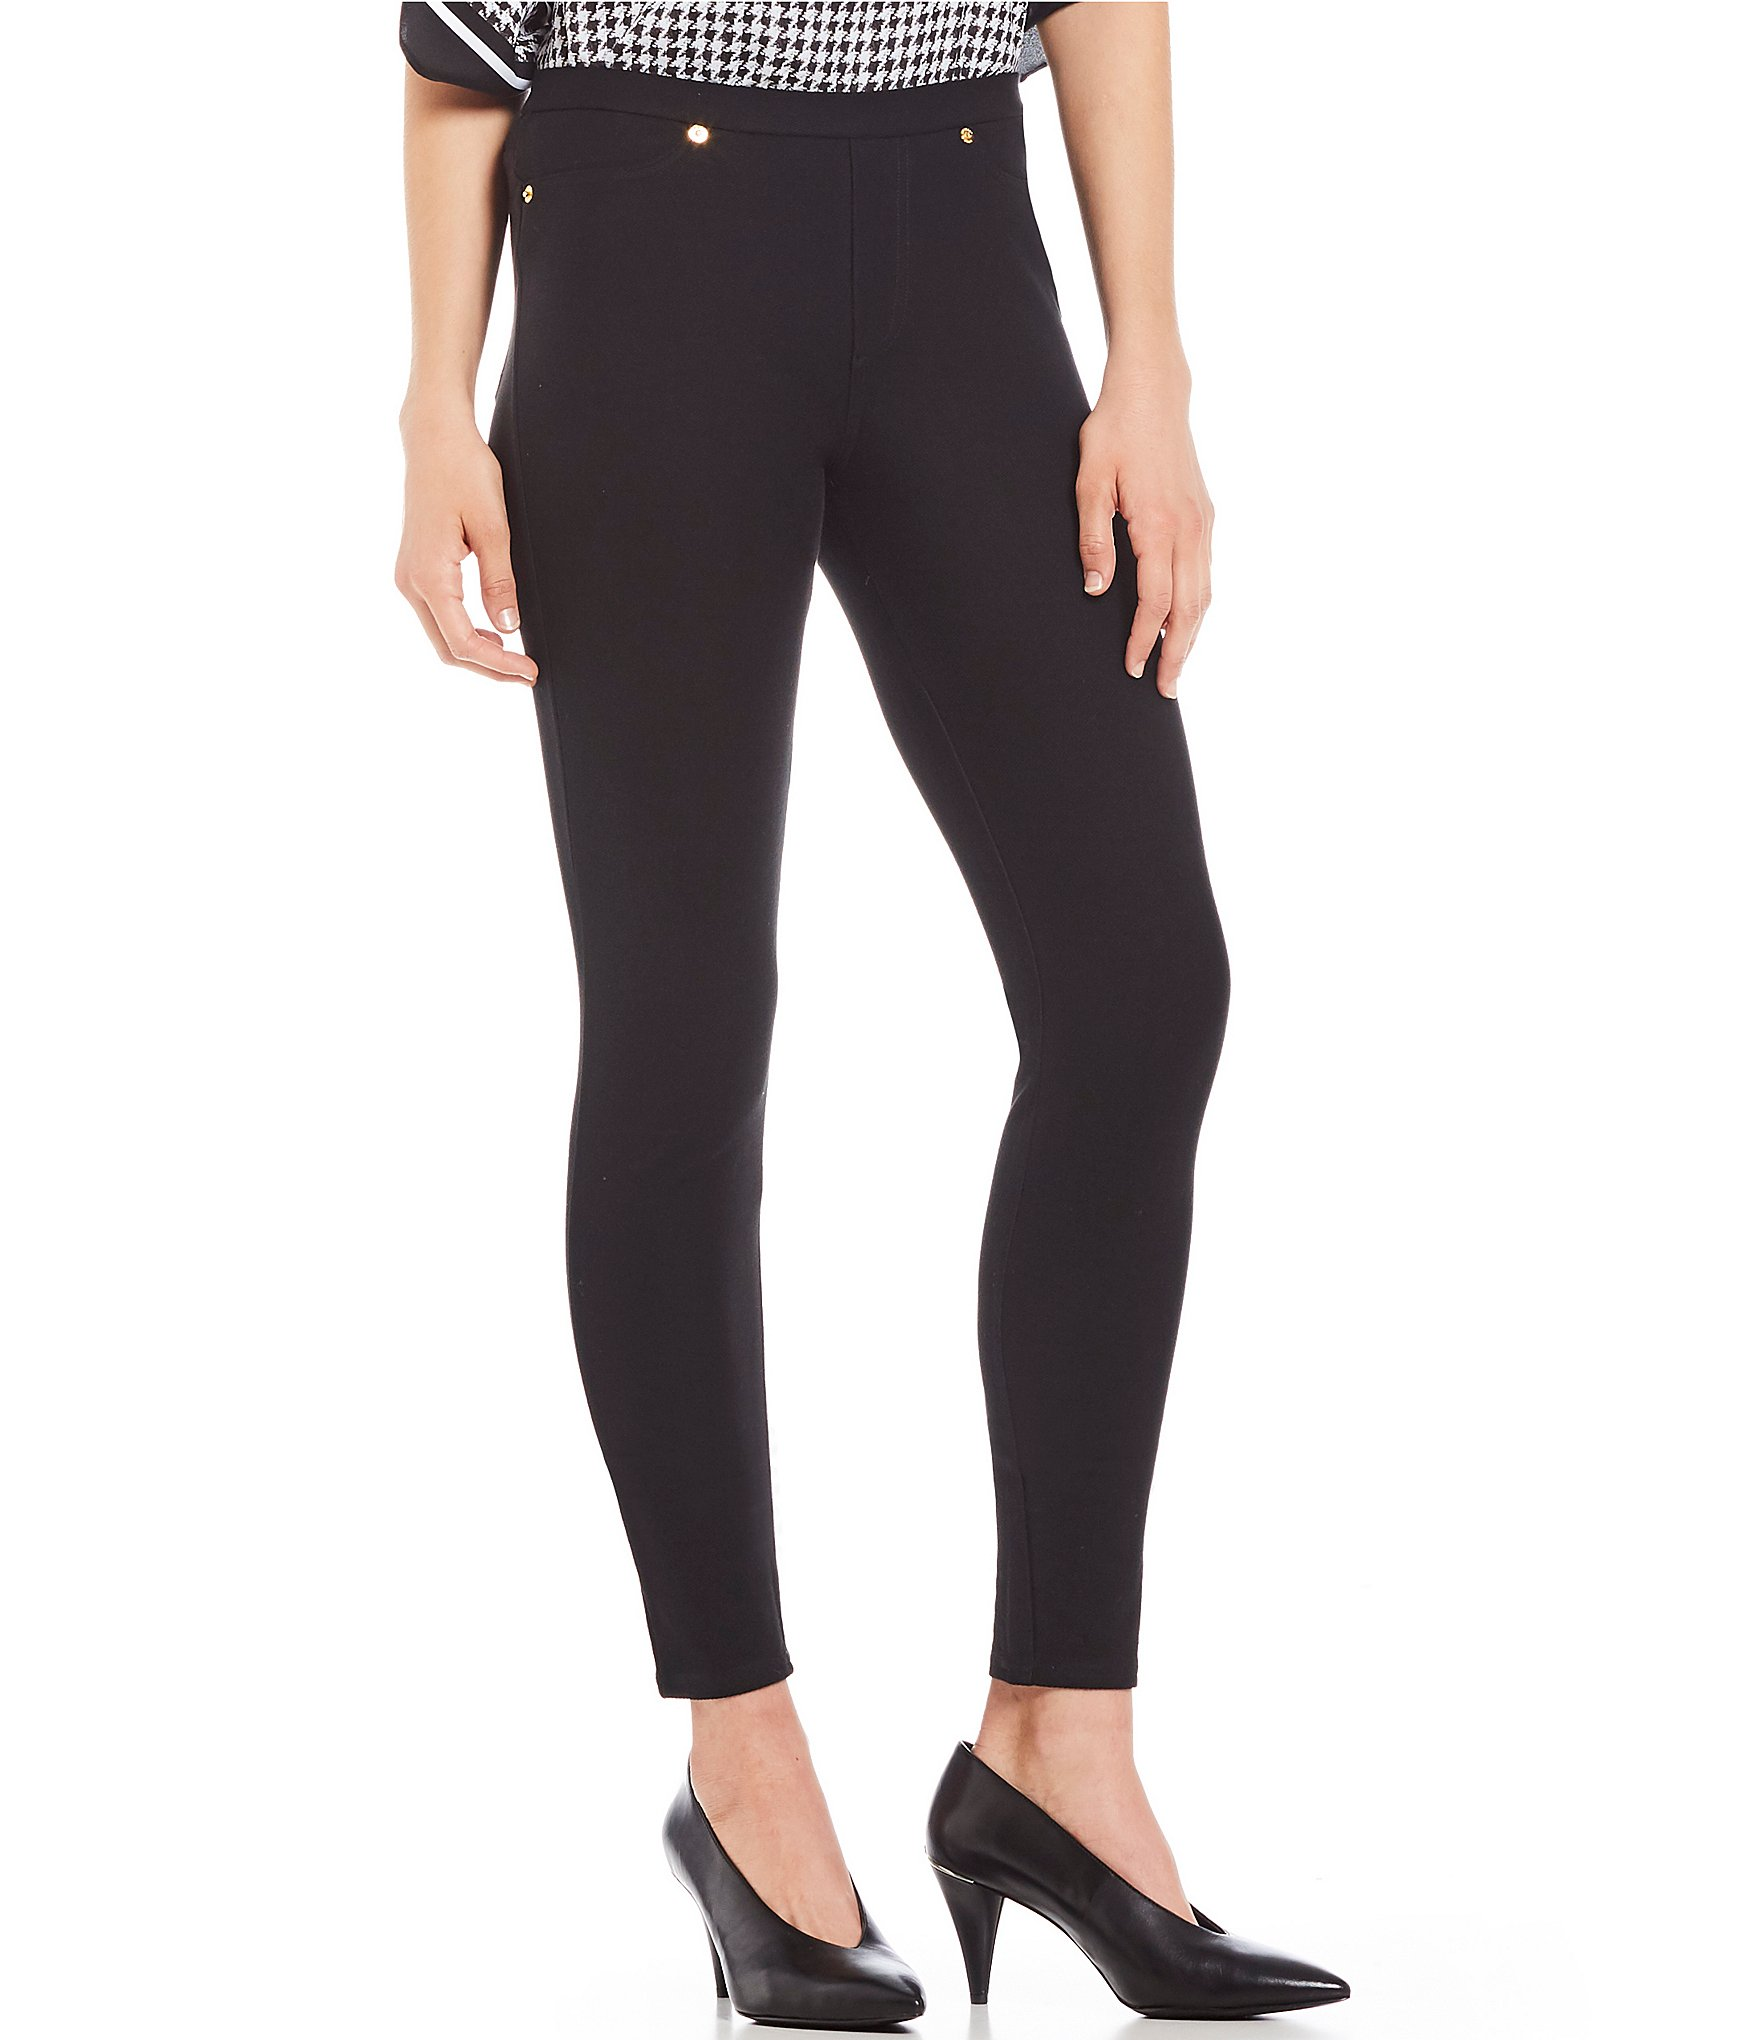 718071009910a black and white: Women's Leggings | Dillard's